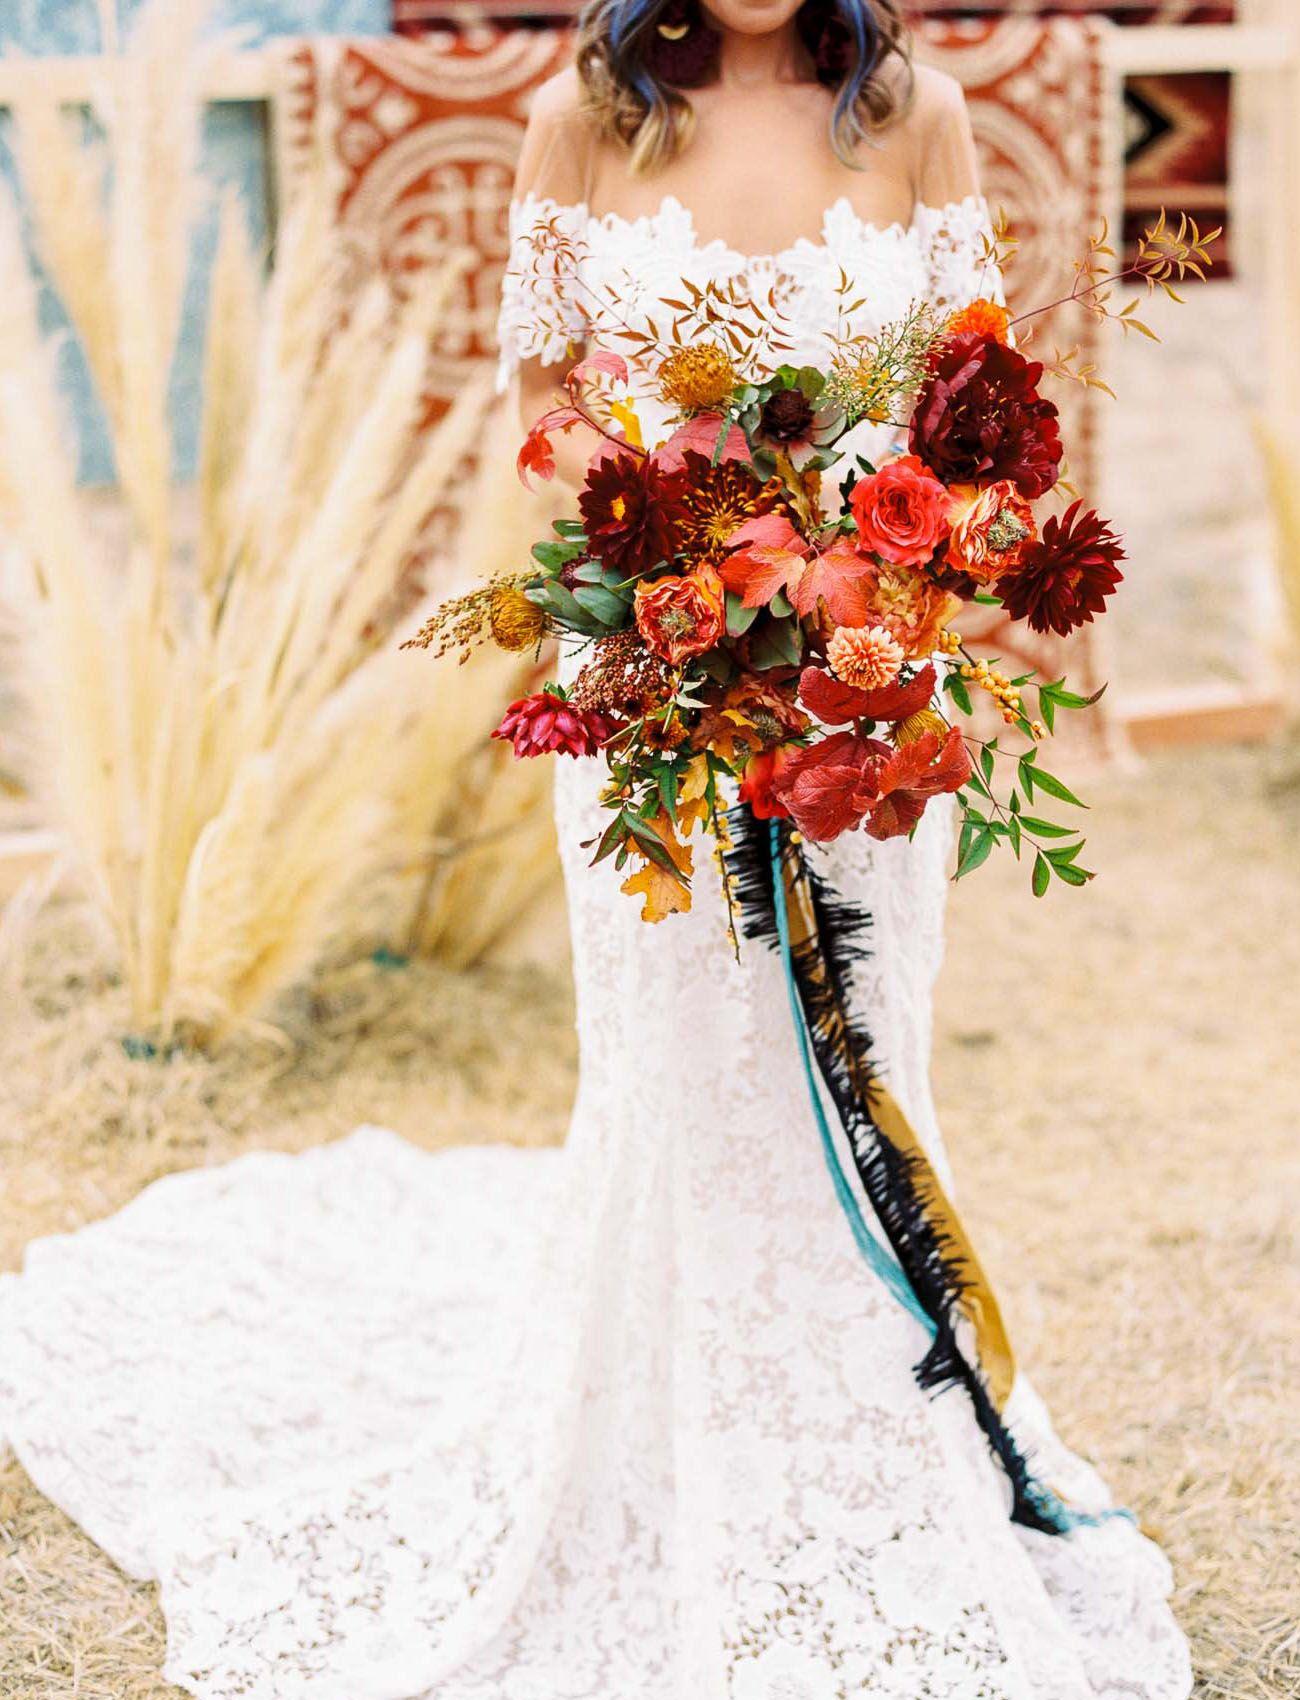 Sultry Southwestern Edgy Meets Bold Boho Wedding Inspiration